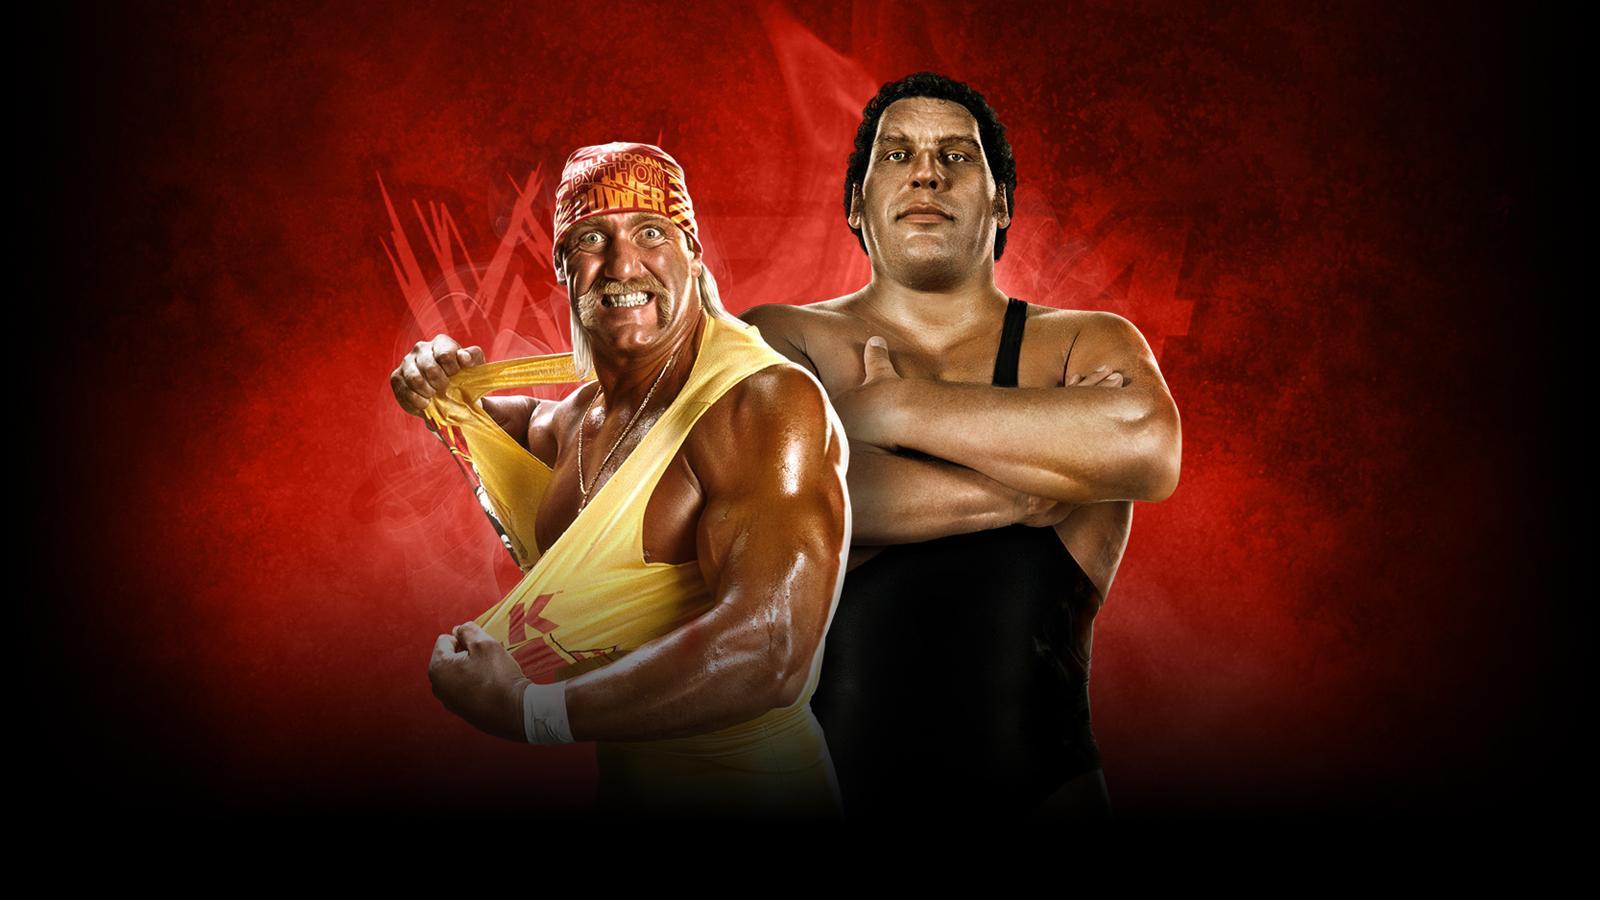 WWE2K14 Wallpaper Rock Warrior PhenomEdition HoganAndre